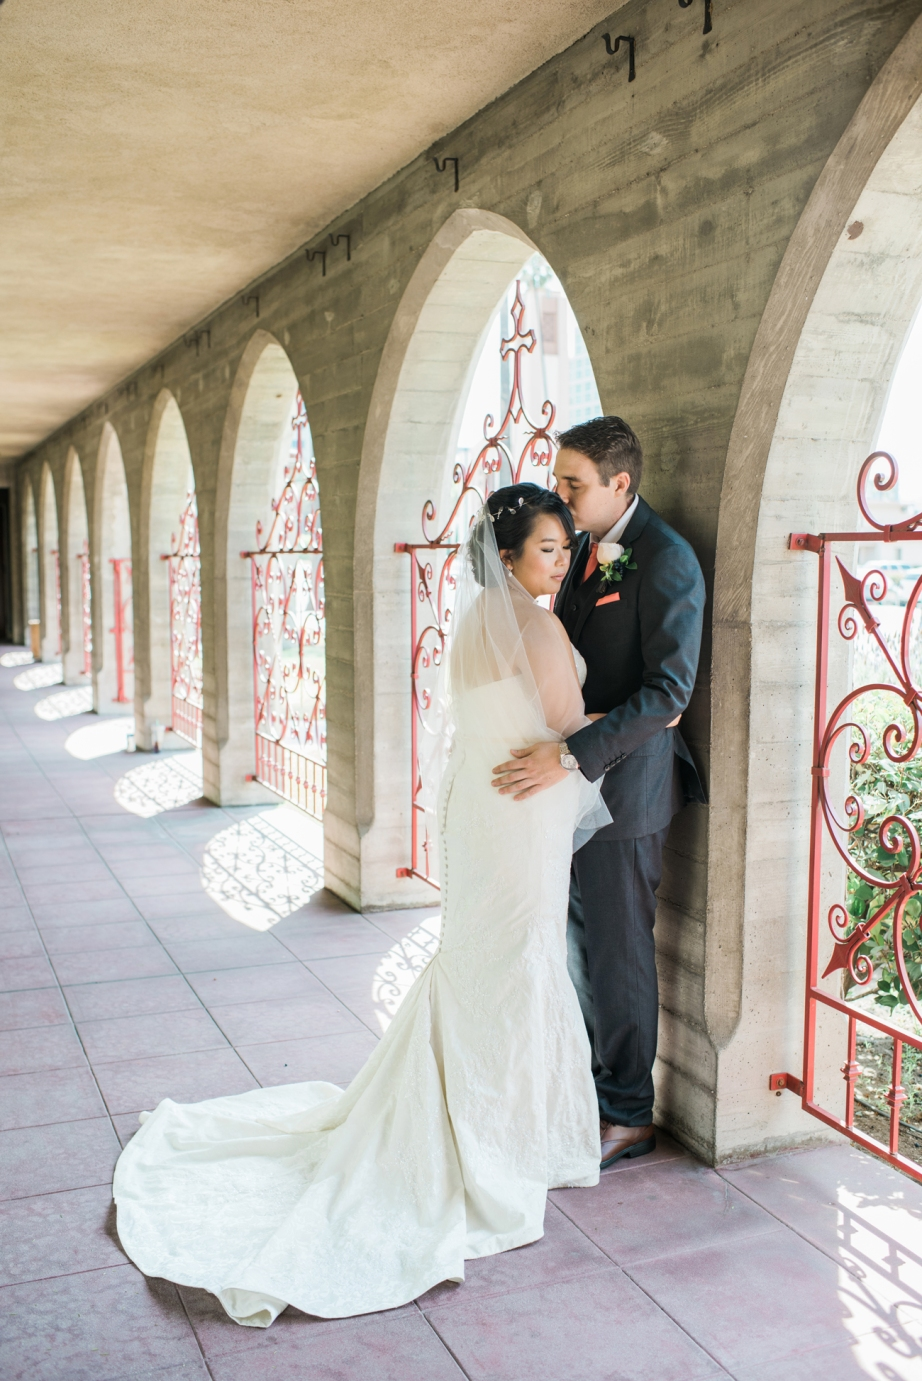 st-marks-episcopal-church-wedding-photo-049